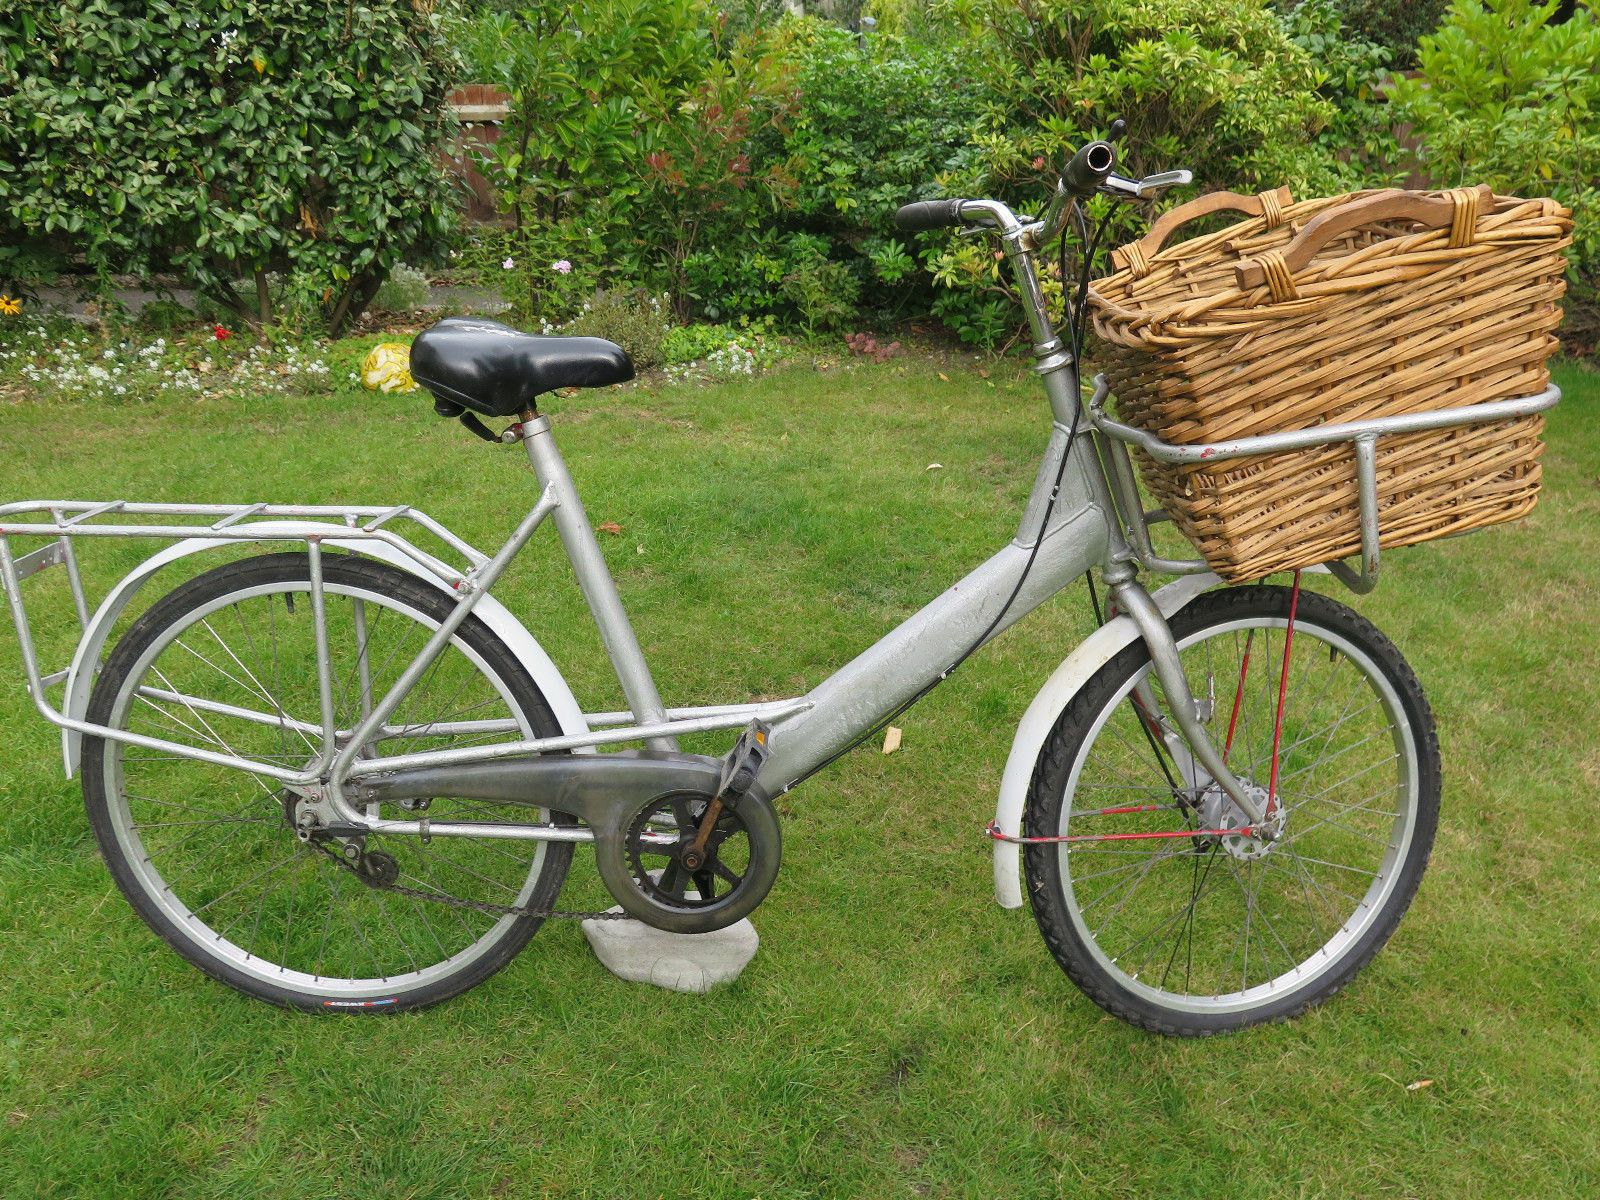 Pashley Pronto Trade Bicycle With Large Basket Vintage Retro Bike